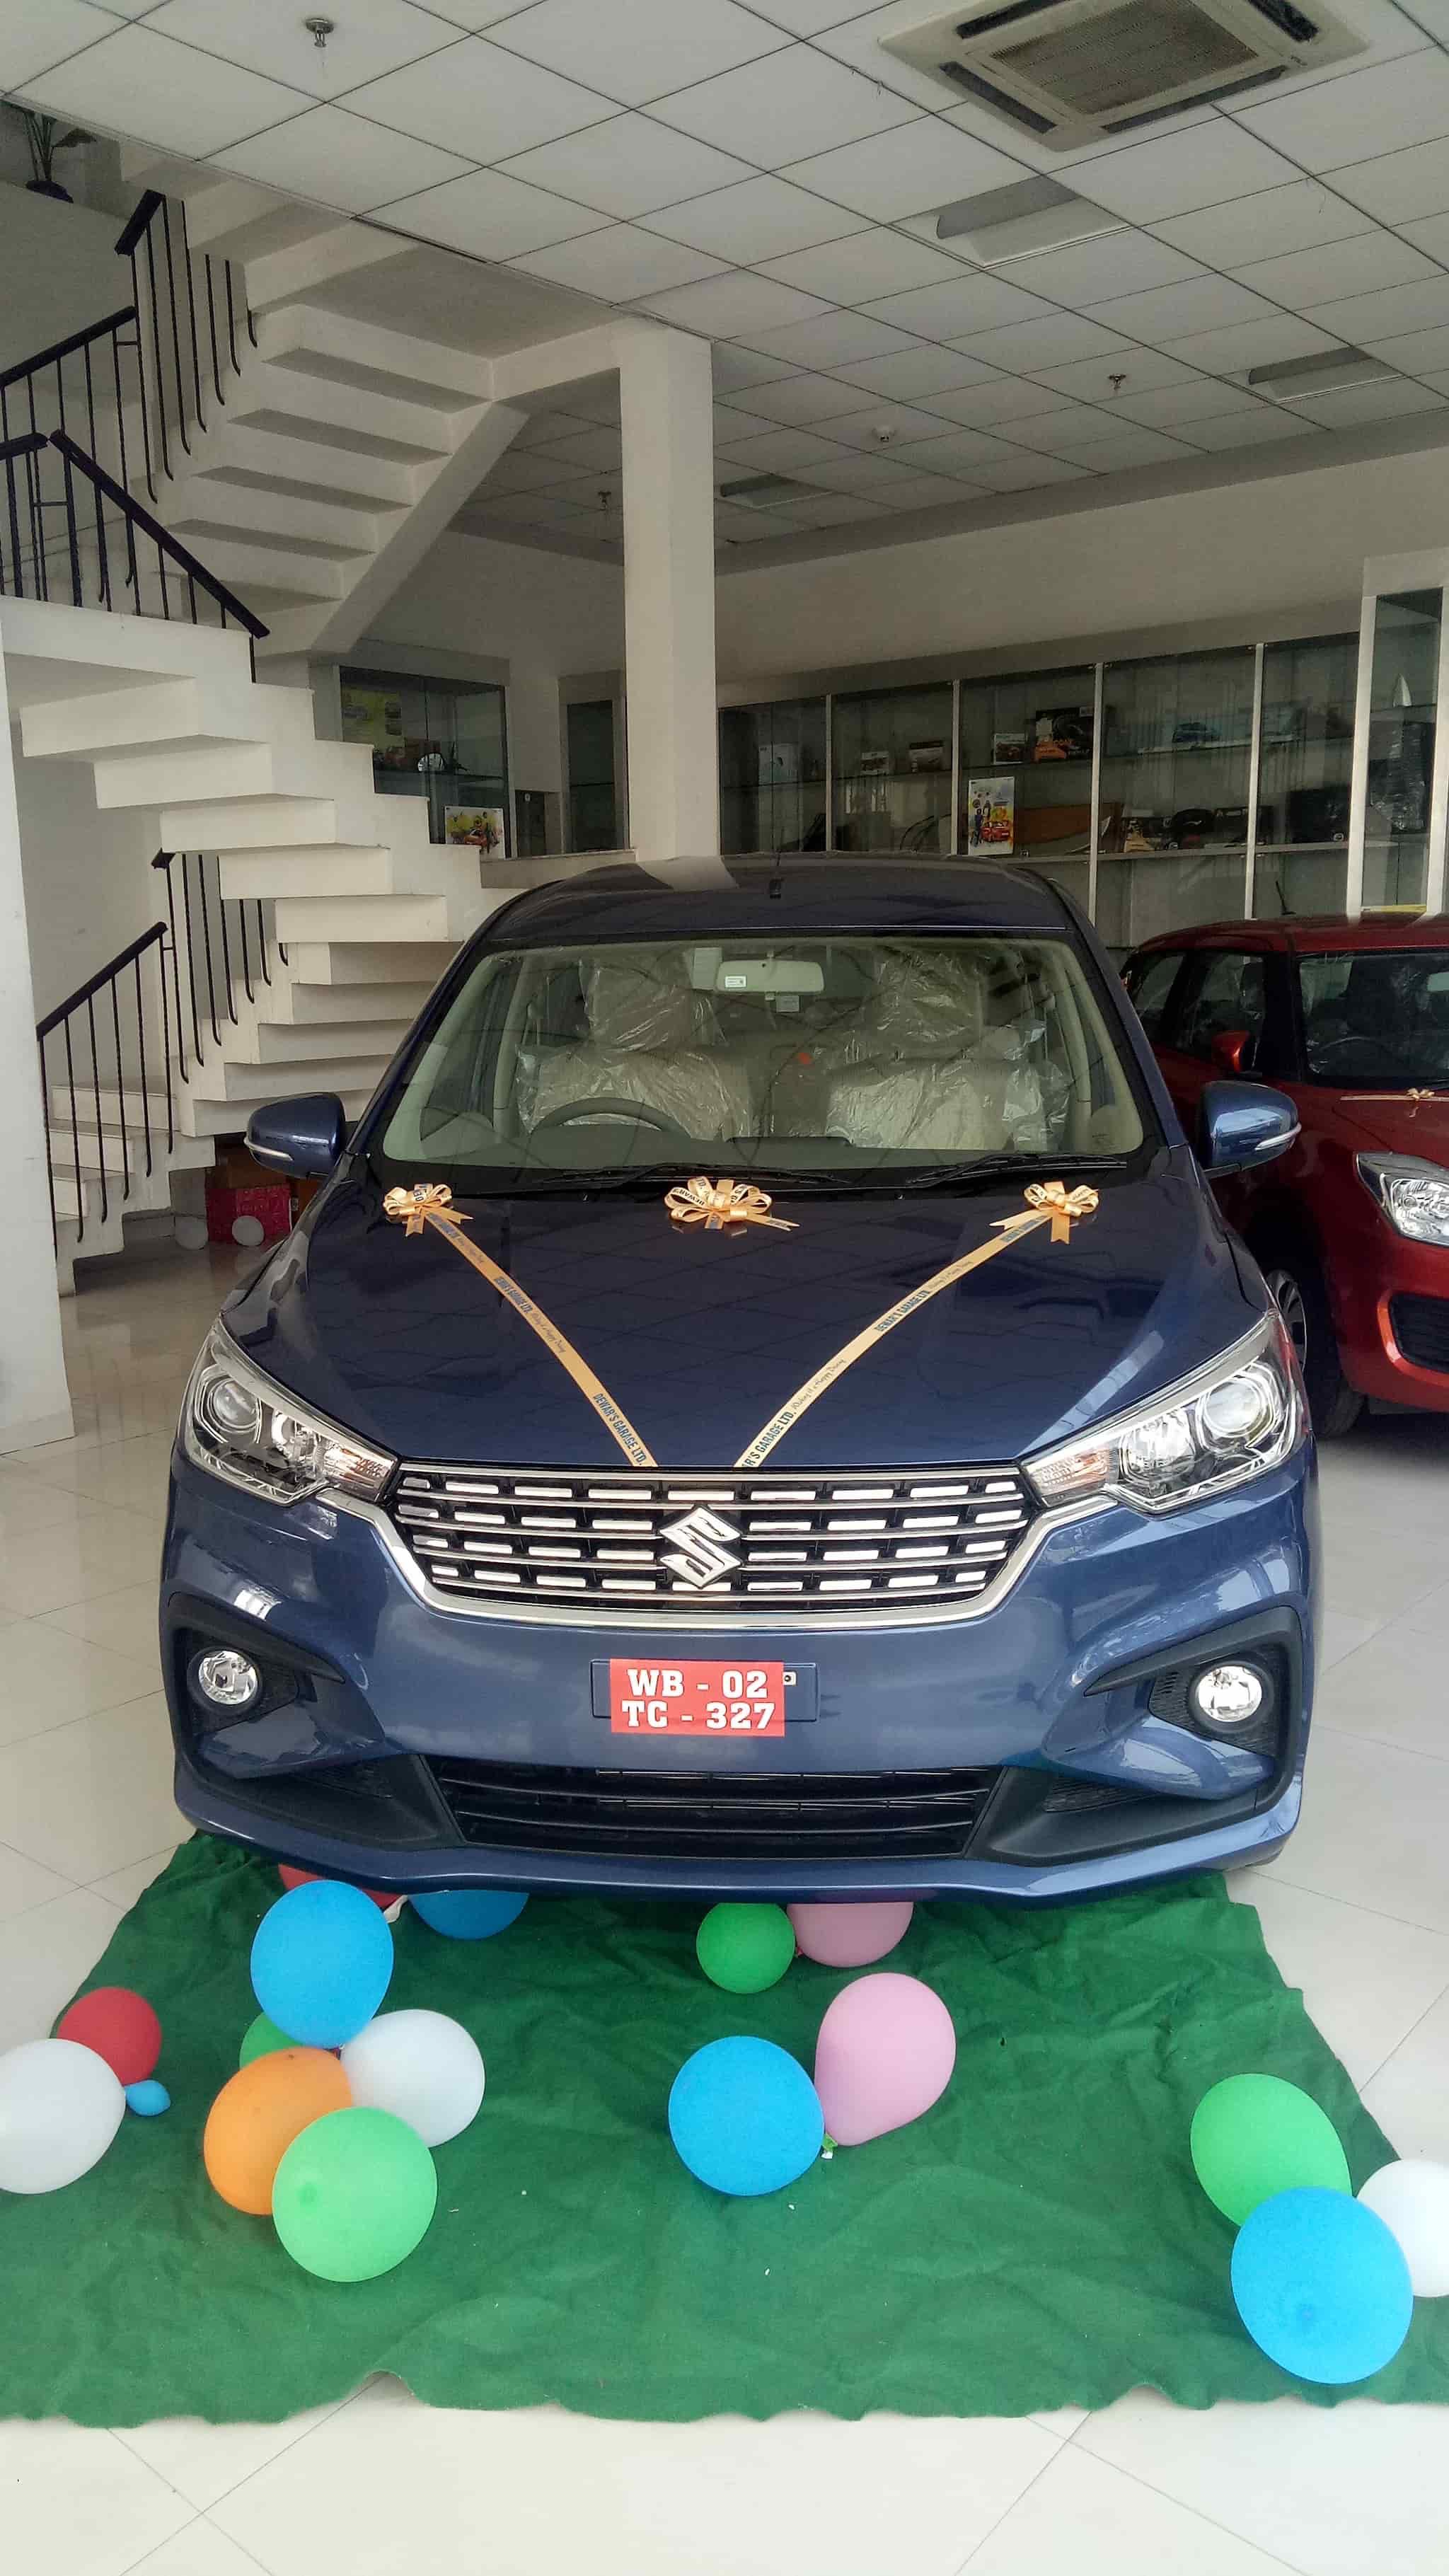 Top 100 Maruti Suzuki Car Dealers in Kolkata - Best Maruti Suzuki Car  Showrooms - Justdial